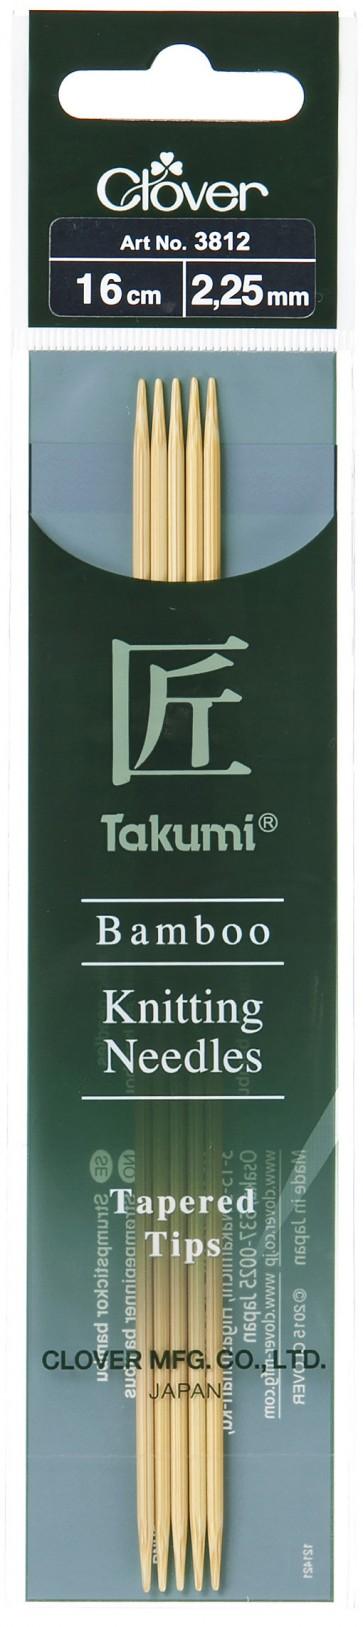 CLOVER Strumpfstrickndl Bambus Takumi 16cm/2.25mm